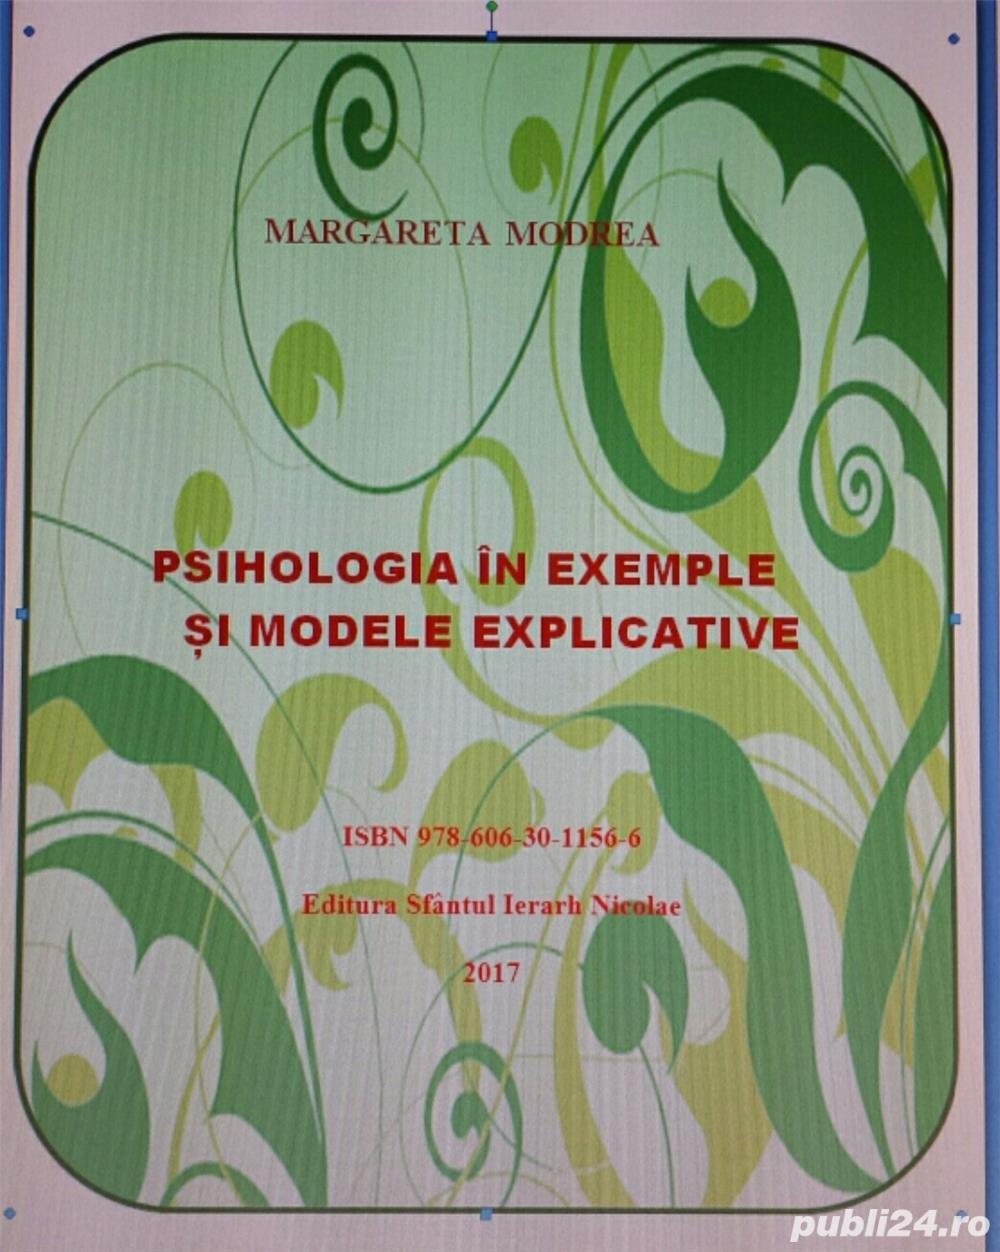 """Psihologia in exemple si modele explicative"" e-Book de Margareta Modrea"